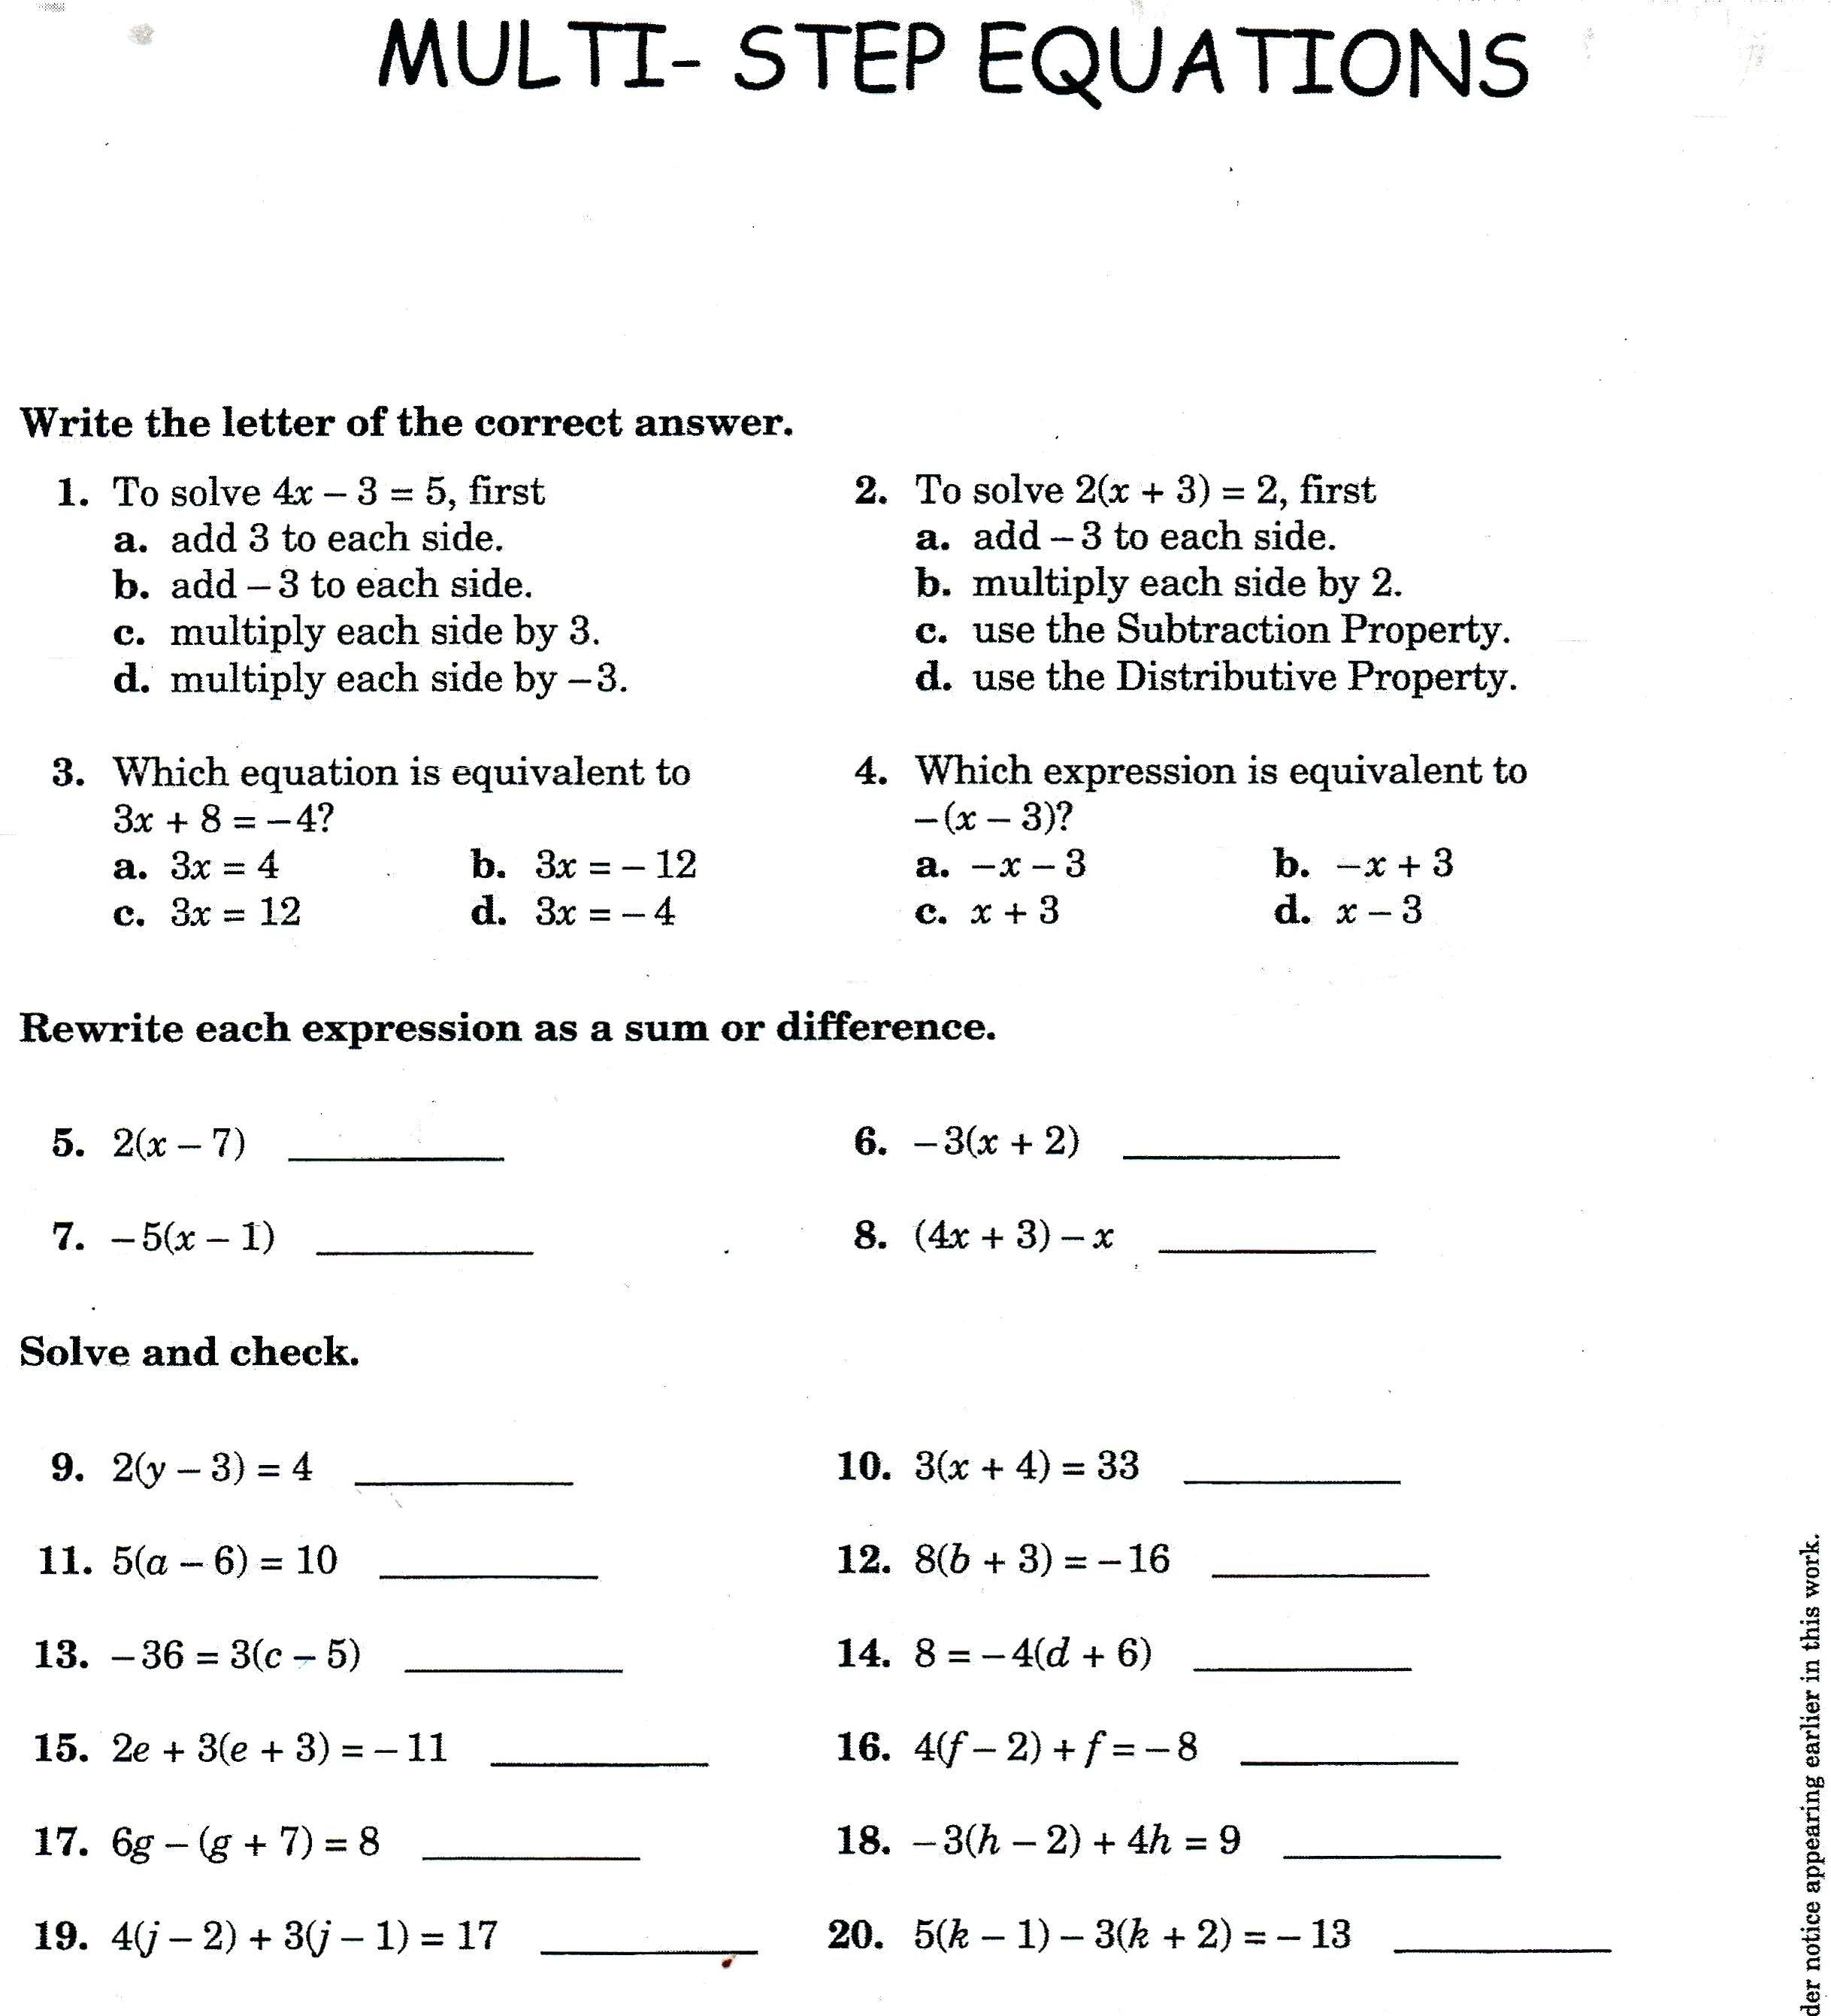 Solving Multistep Equations Math Two Step Algebra Equations For Solving Multi Step Equations With Distributive Property Worksheet